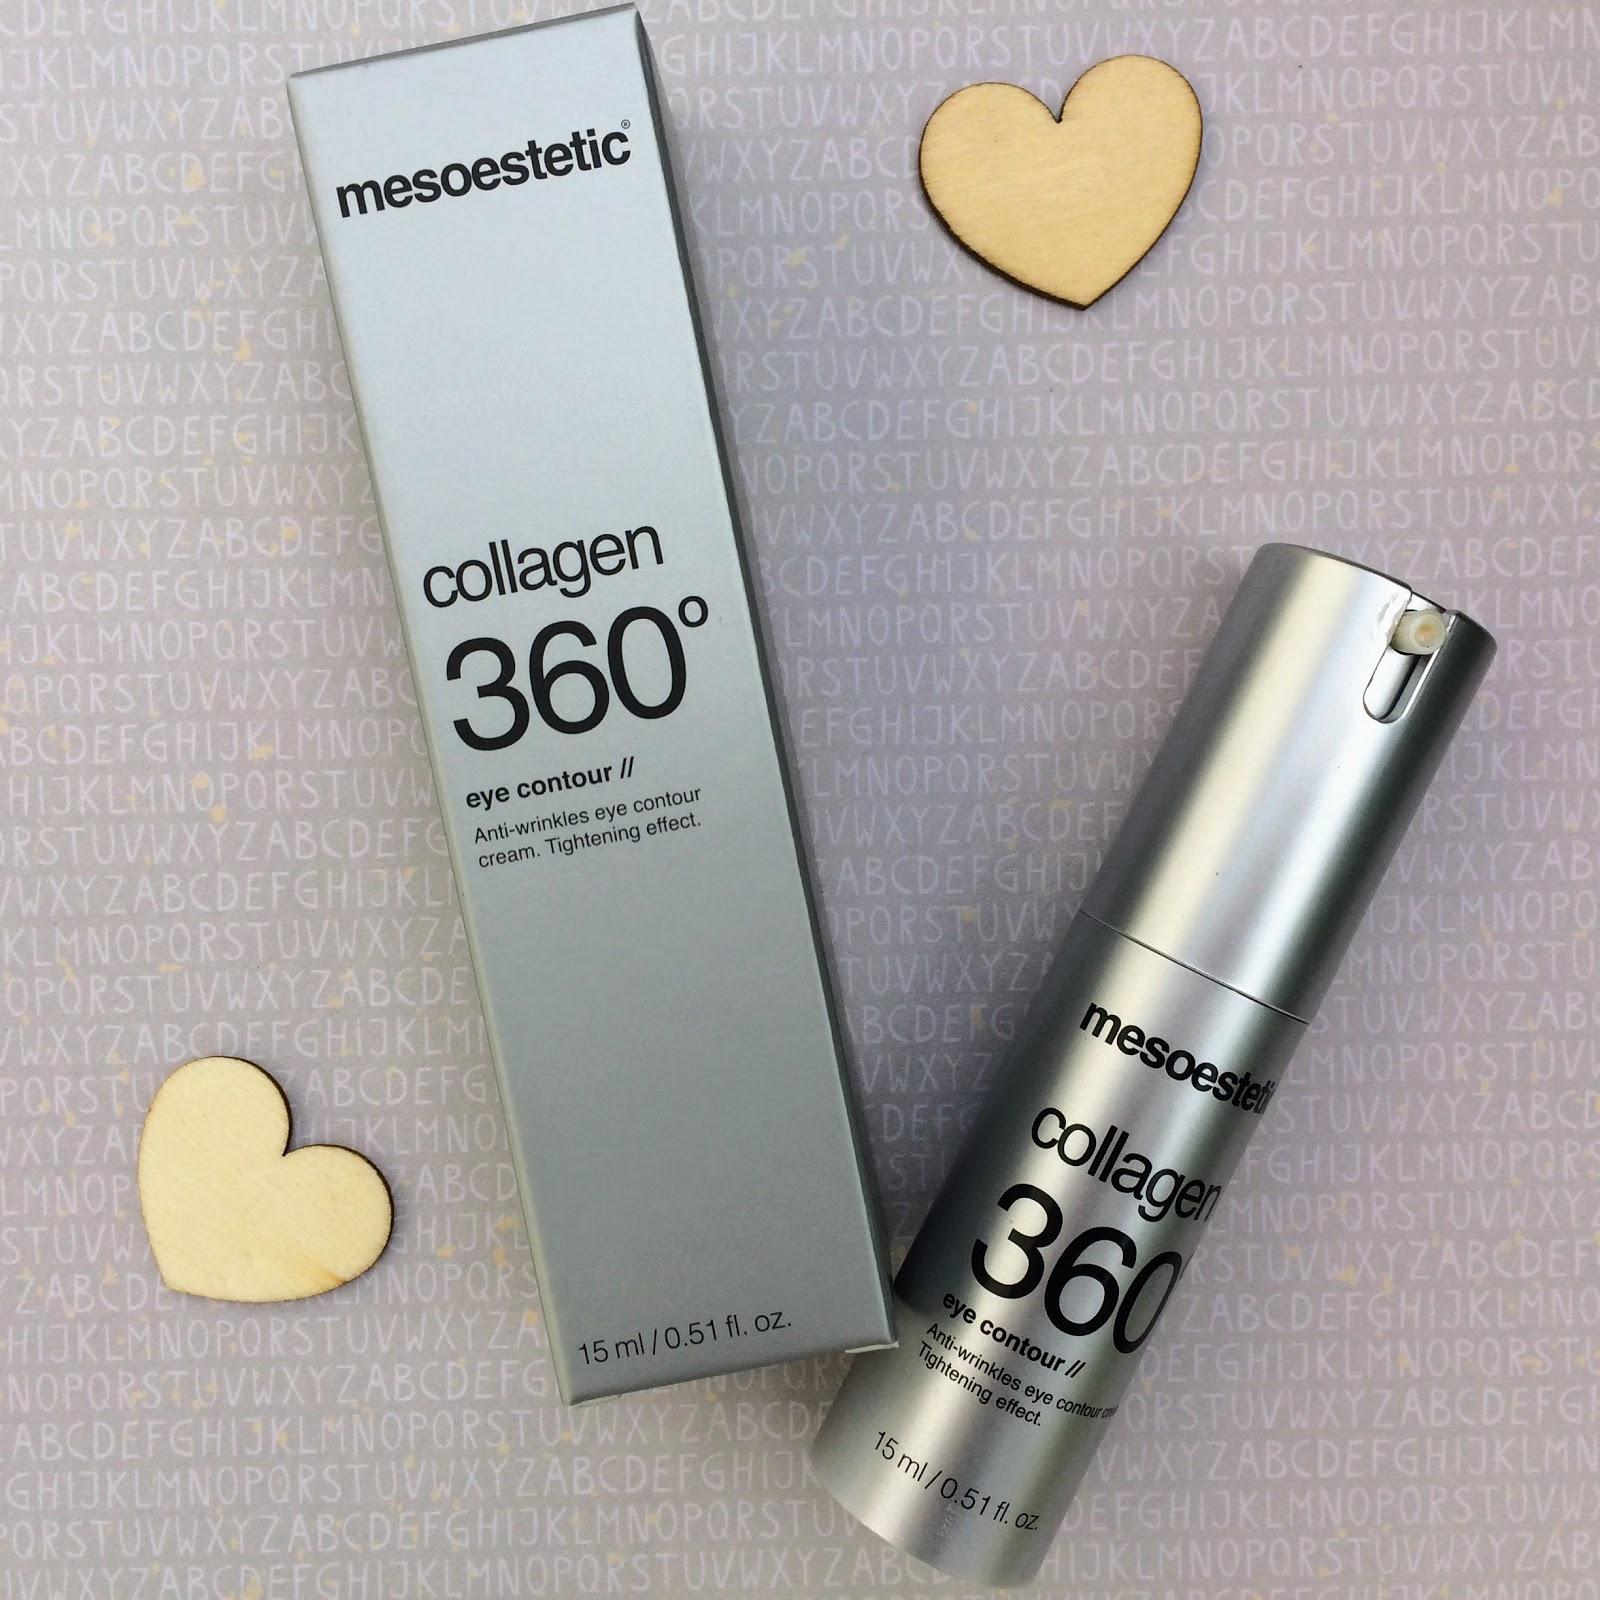 Mesoestetic collagen 360 eye cream